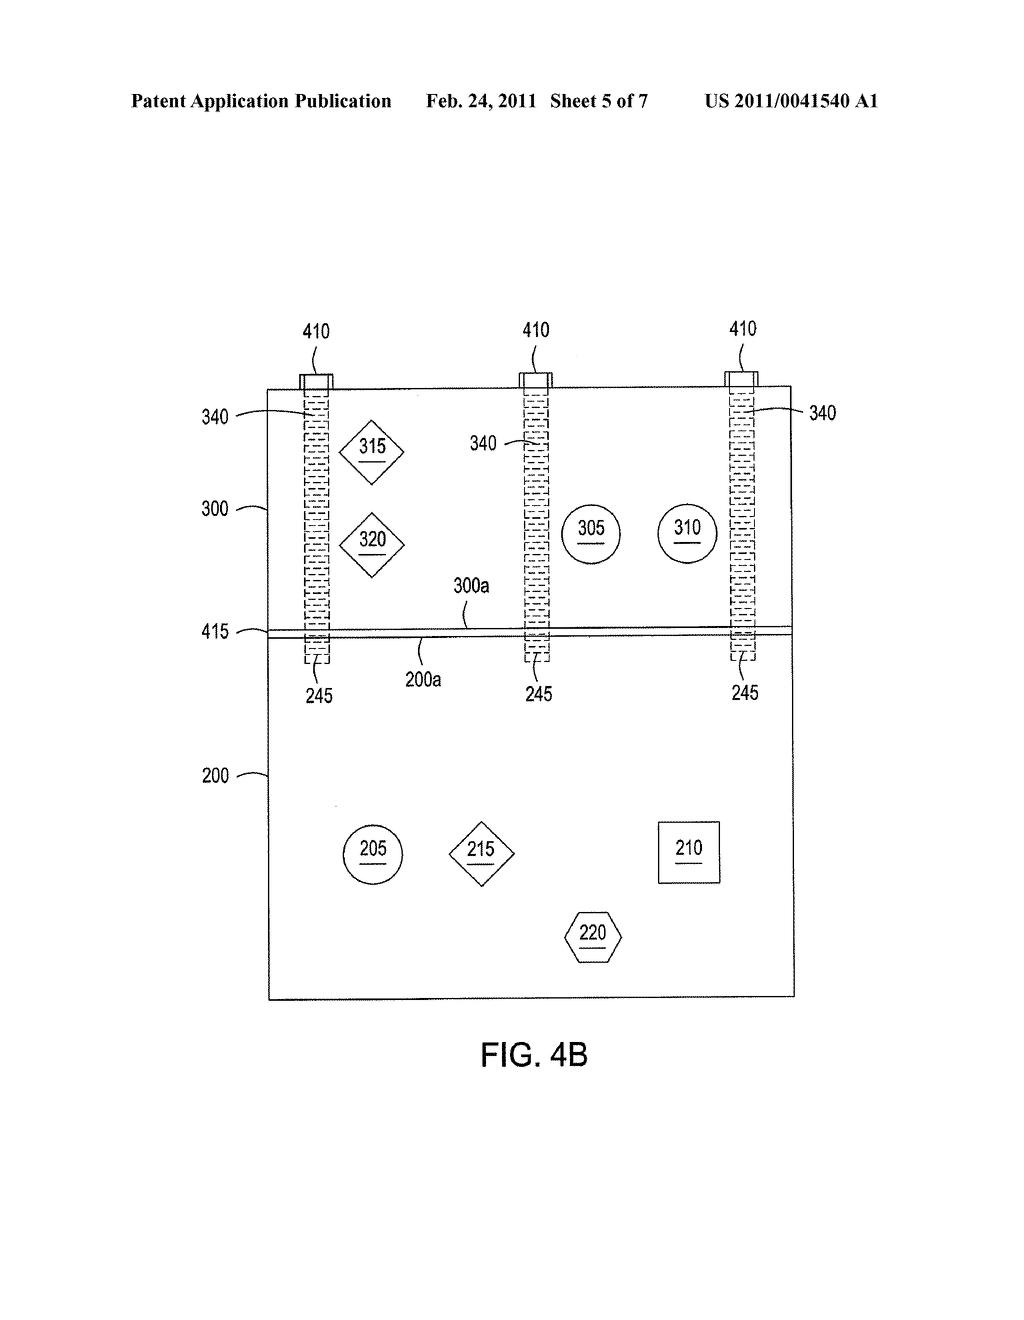 modular upgradeable pneumatic hydraulic manifold diagram rh patentsencyclopedia com Basic Hydraulic Schematics hydraulic manifold schematic symbols